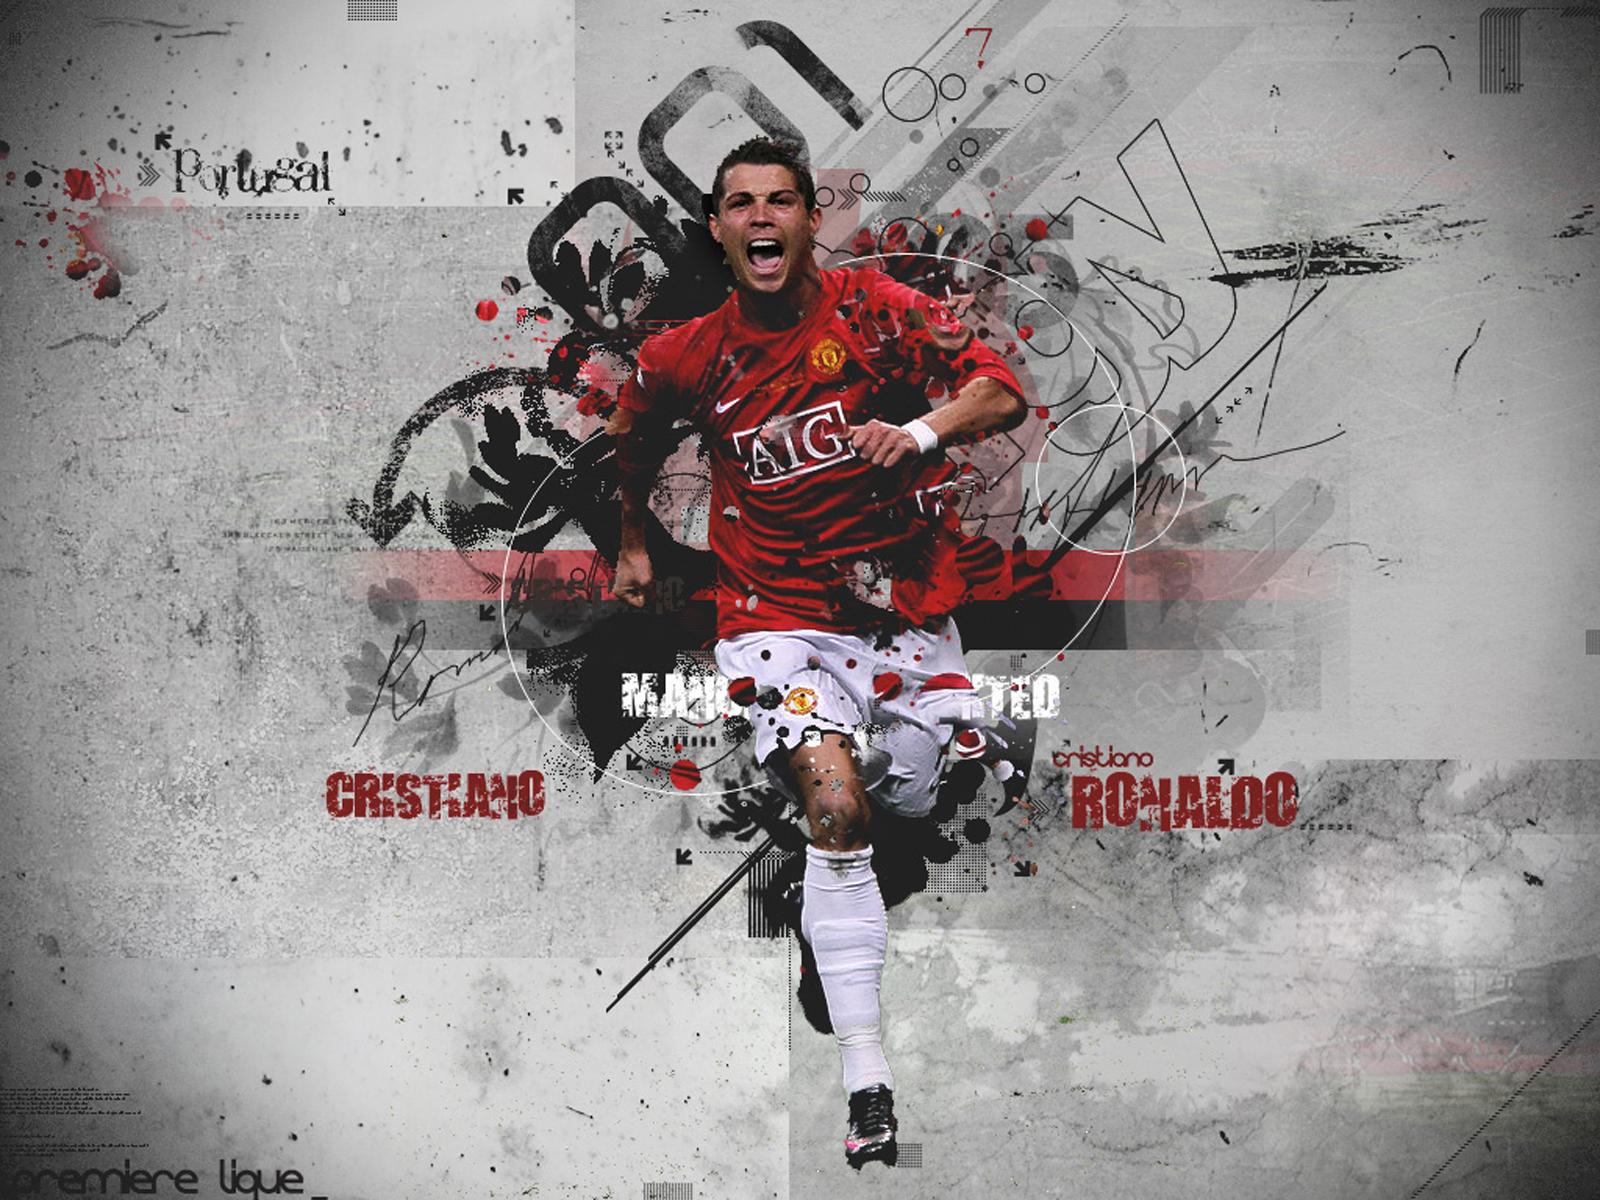 http://4.bp.blogspot.com/-TEvAim-k7GA/Td2oeBp6rEI/AAAAAAAAAPE/bdKTFBsolf8/s1600/Cristiano-Ronaldo-HD-Wallpapers-2011-3.jpg